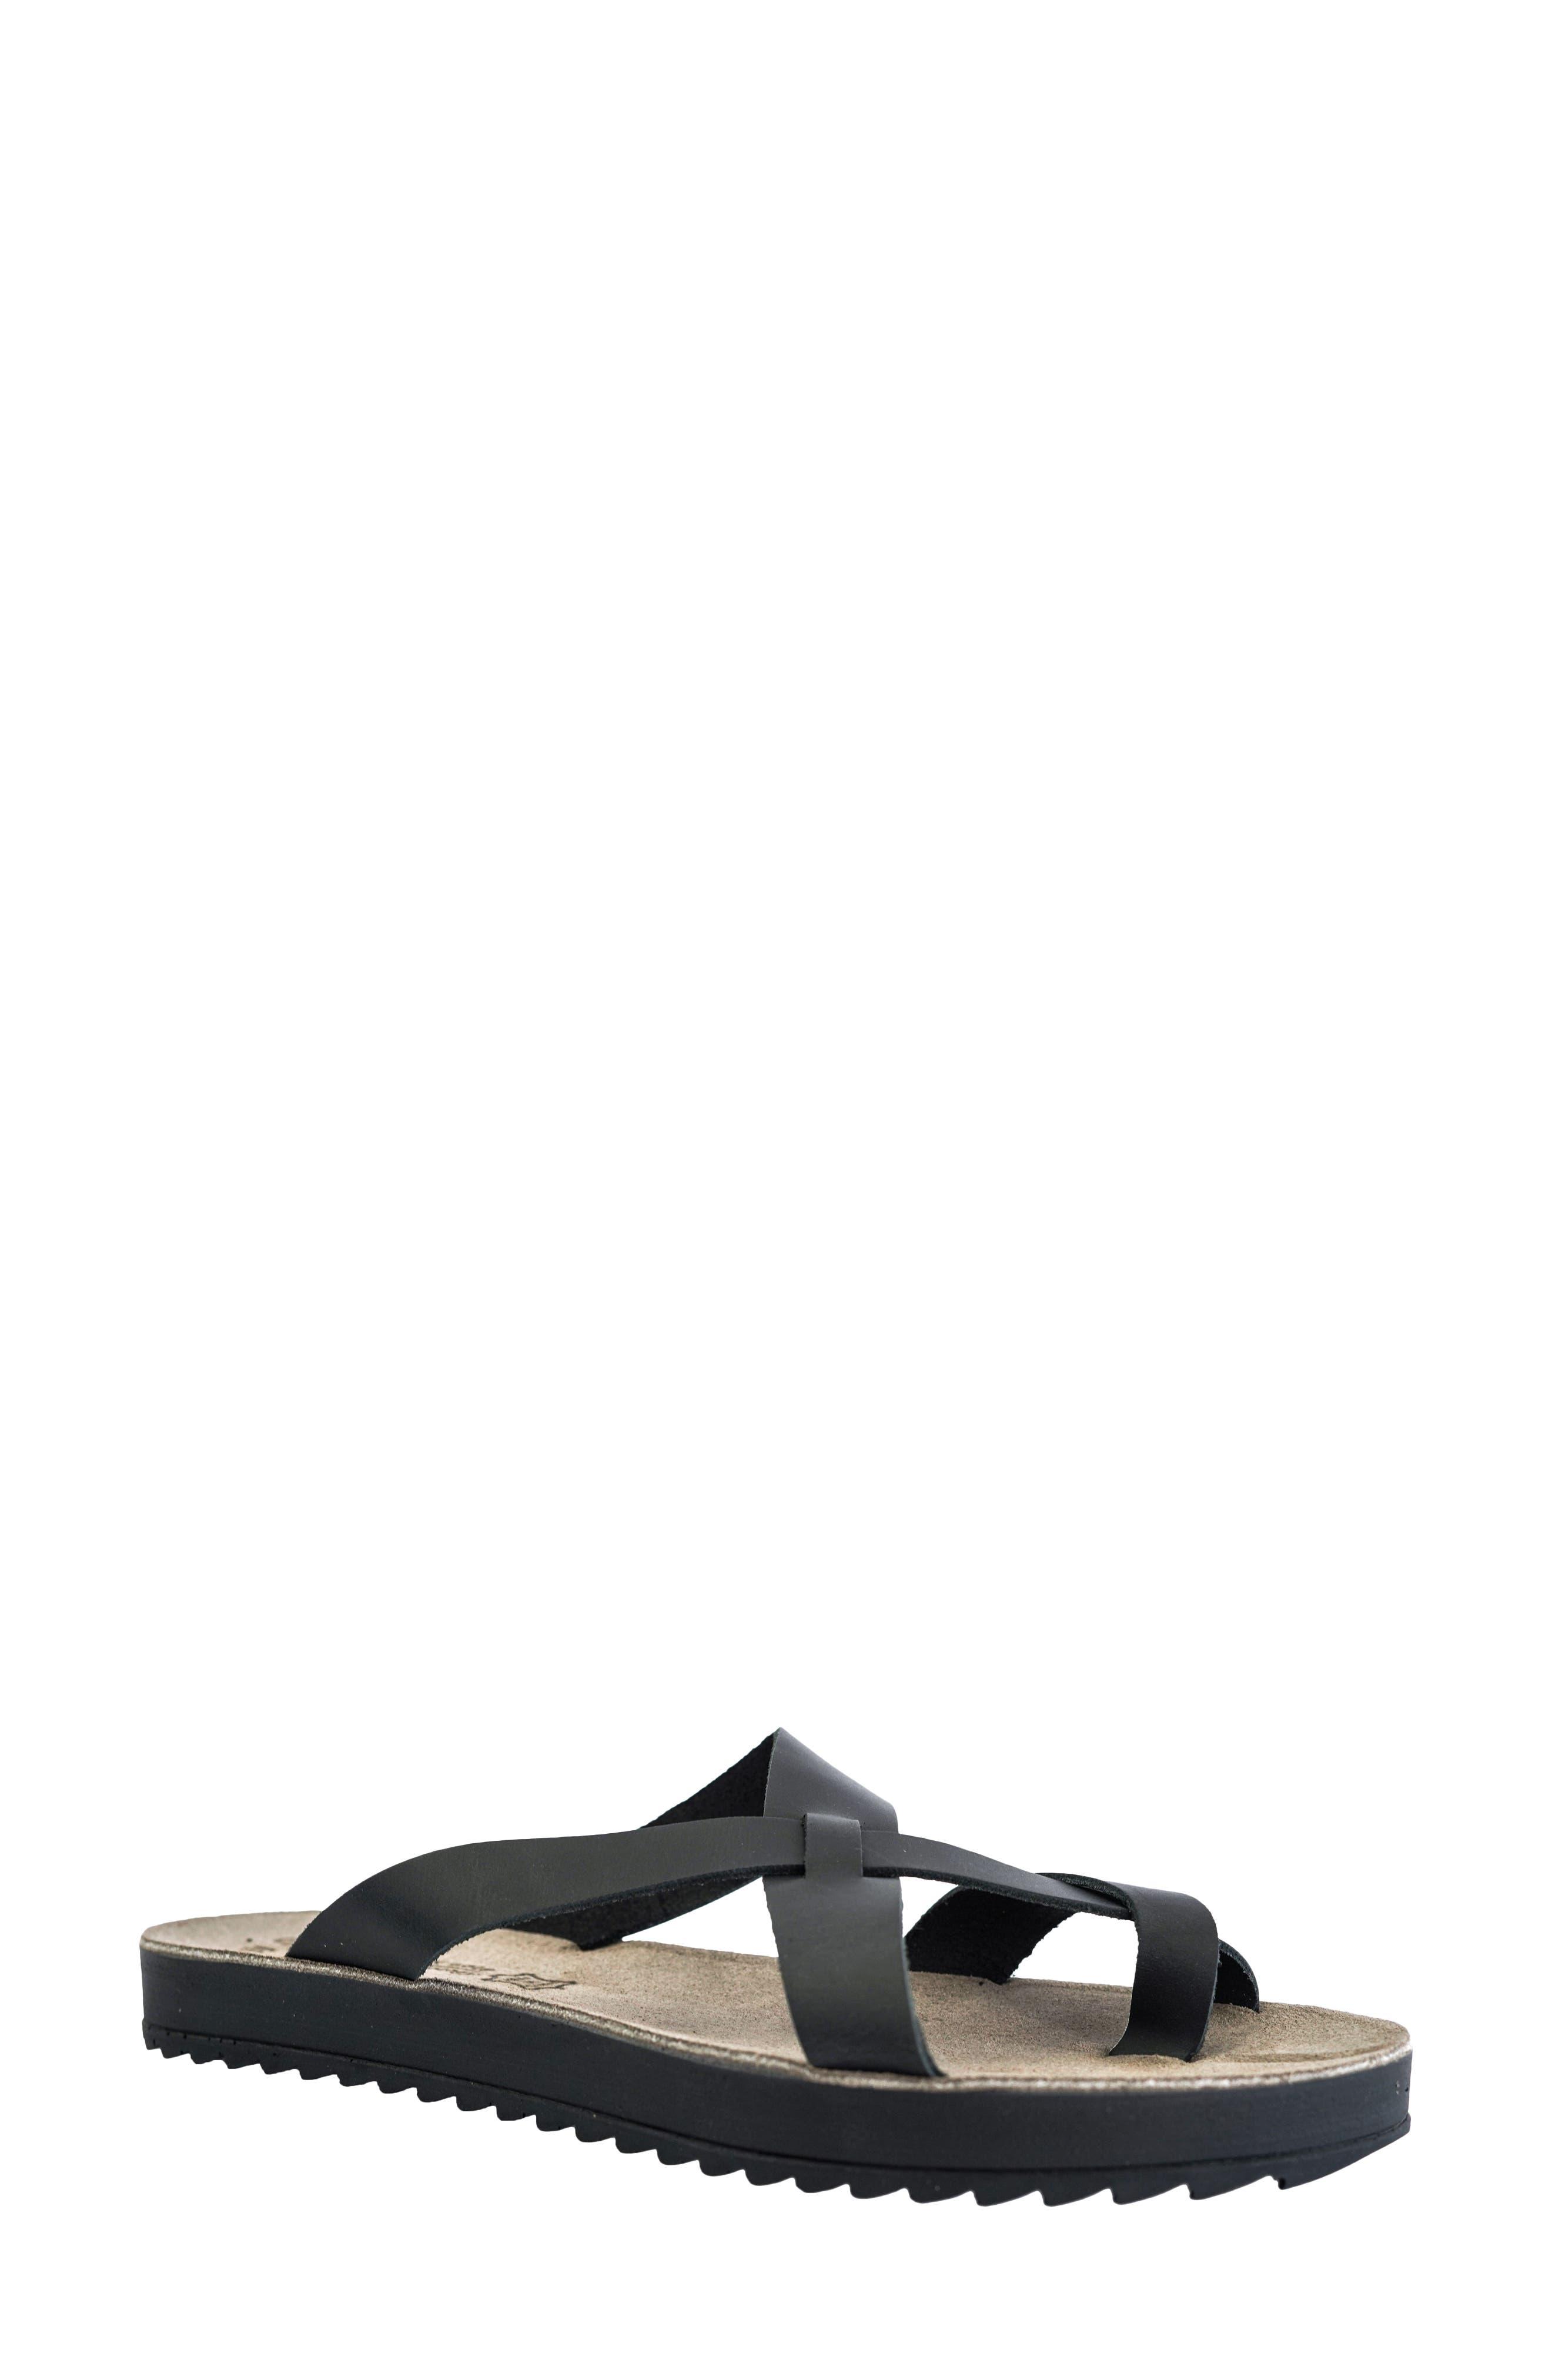 Kimolos Sandal